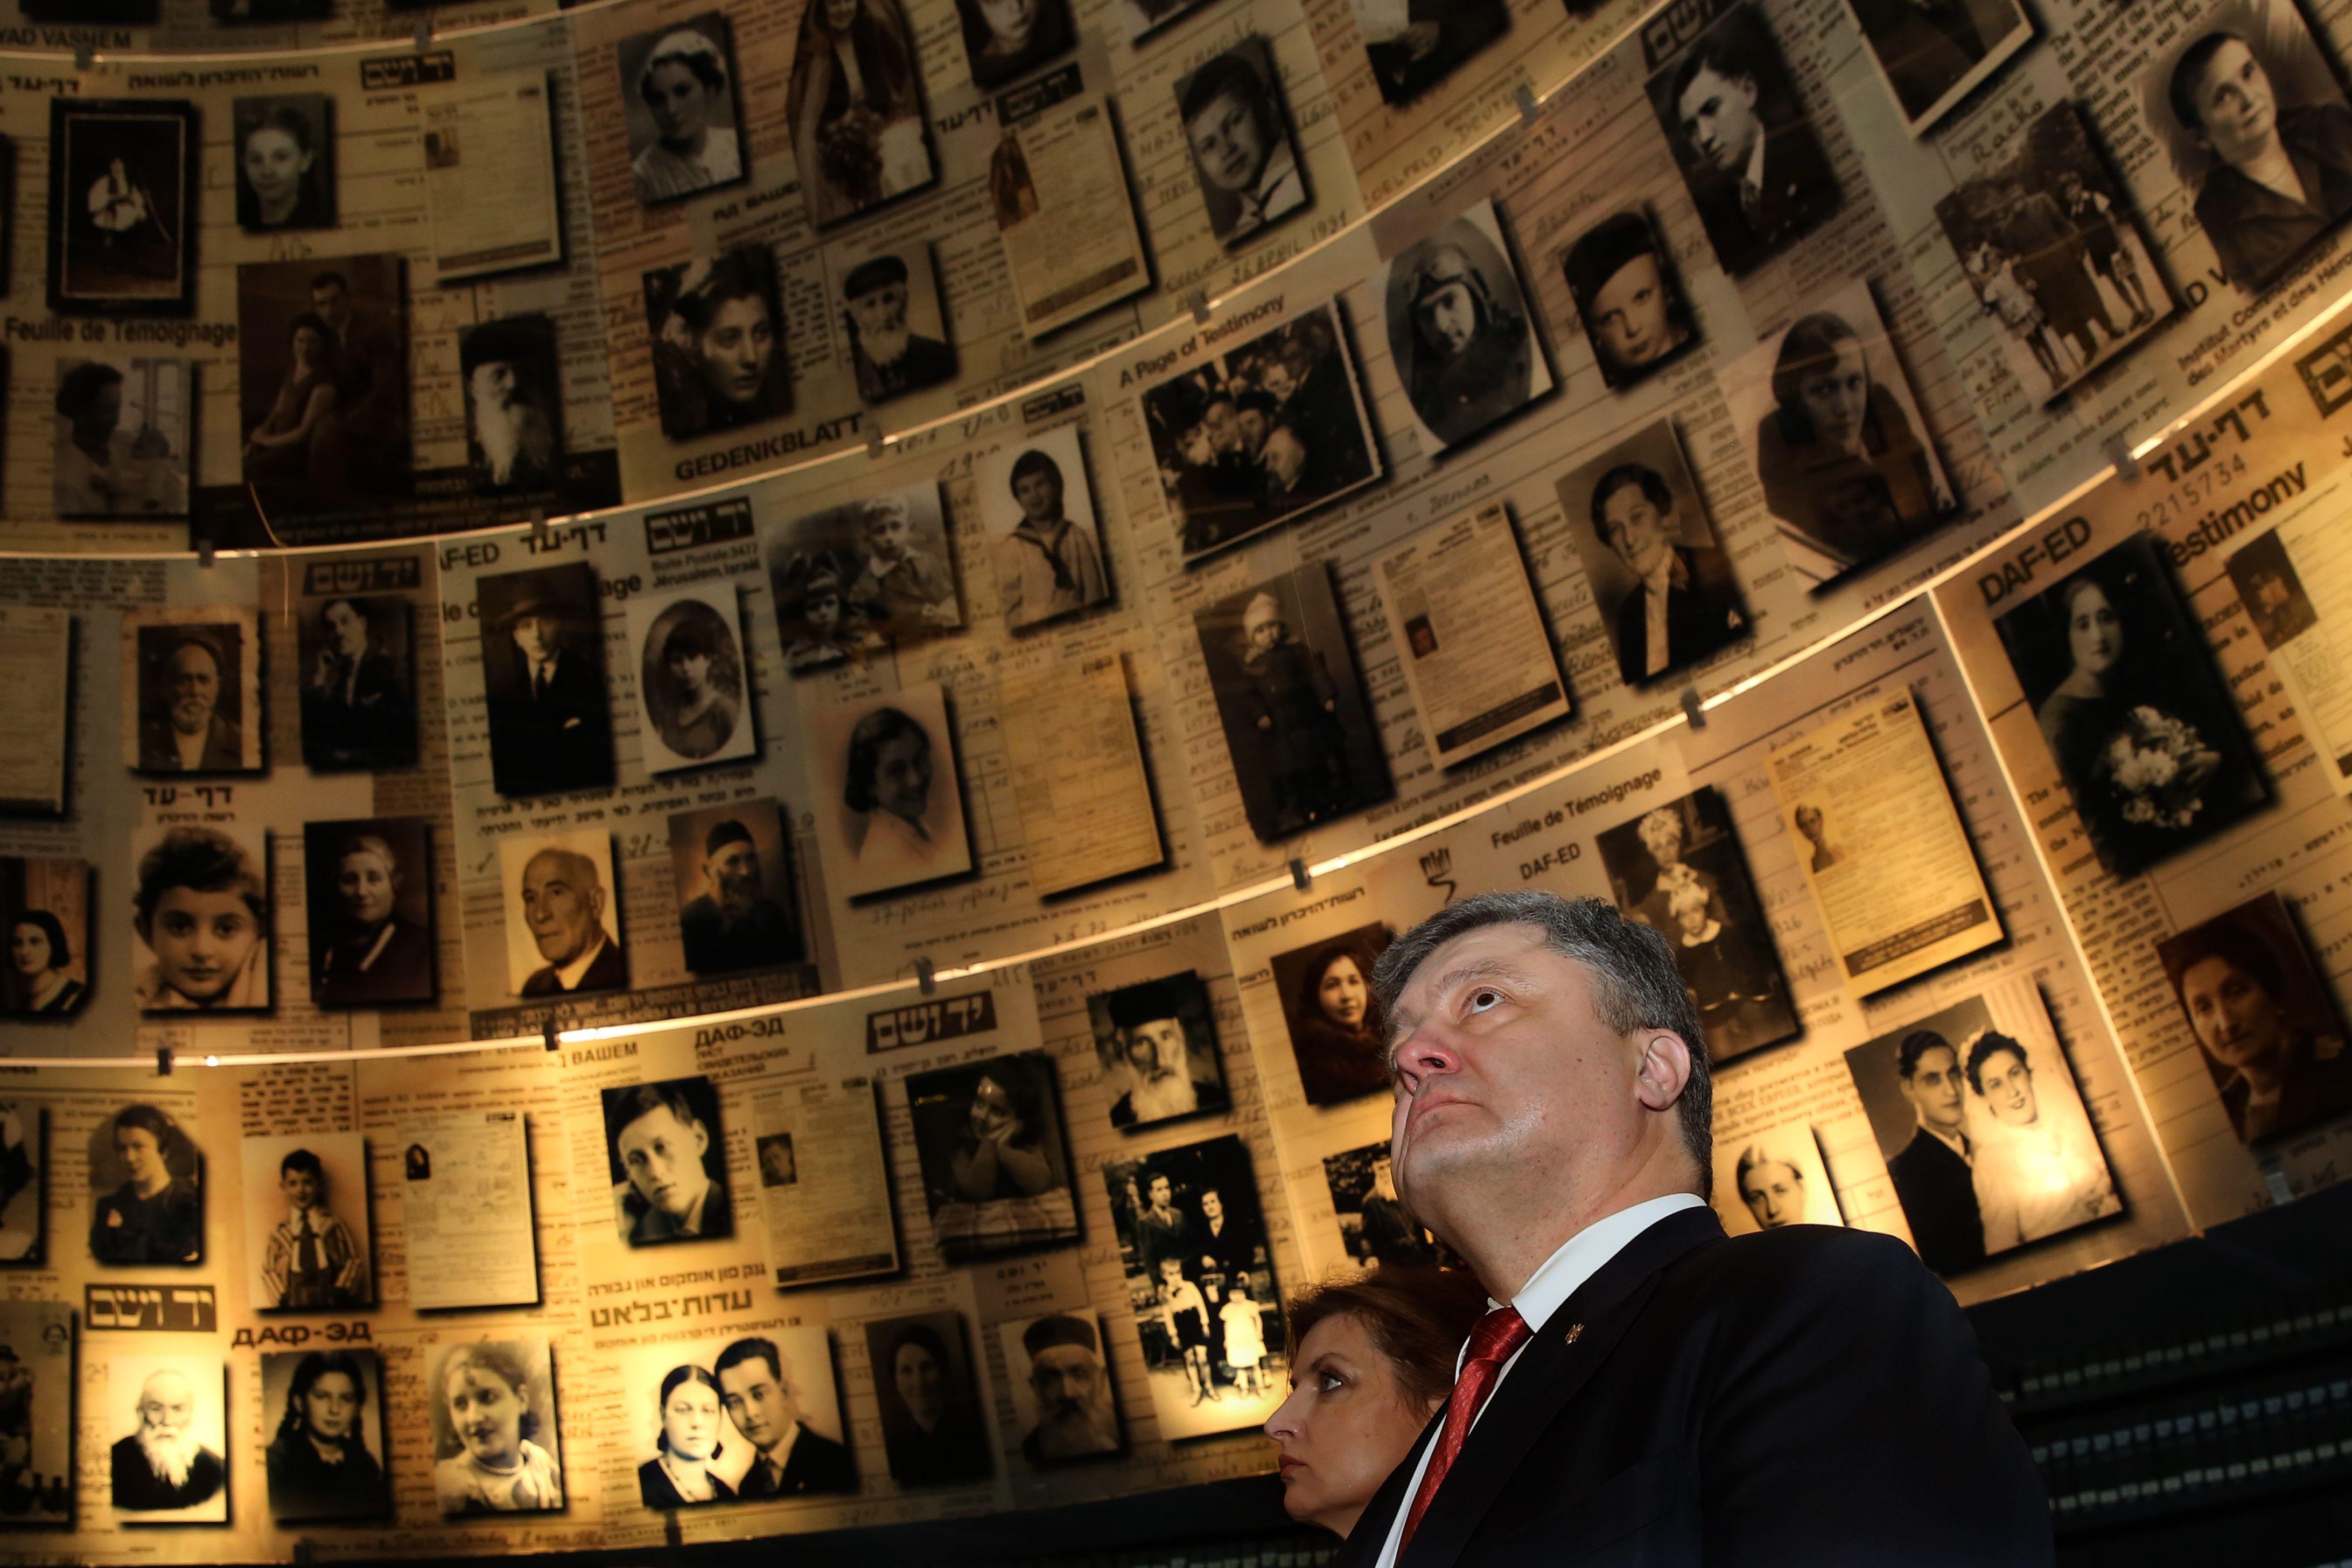 Ukrainian president Petro Poroshenko at Yad Vashem during a recent visit to Israel.